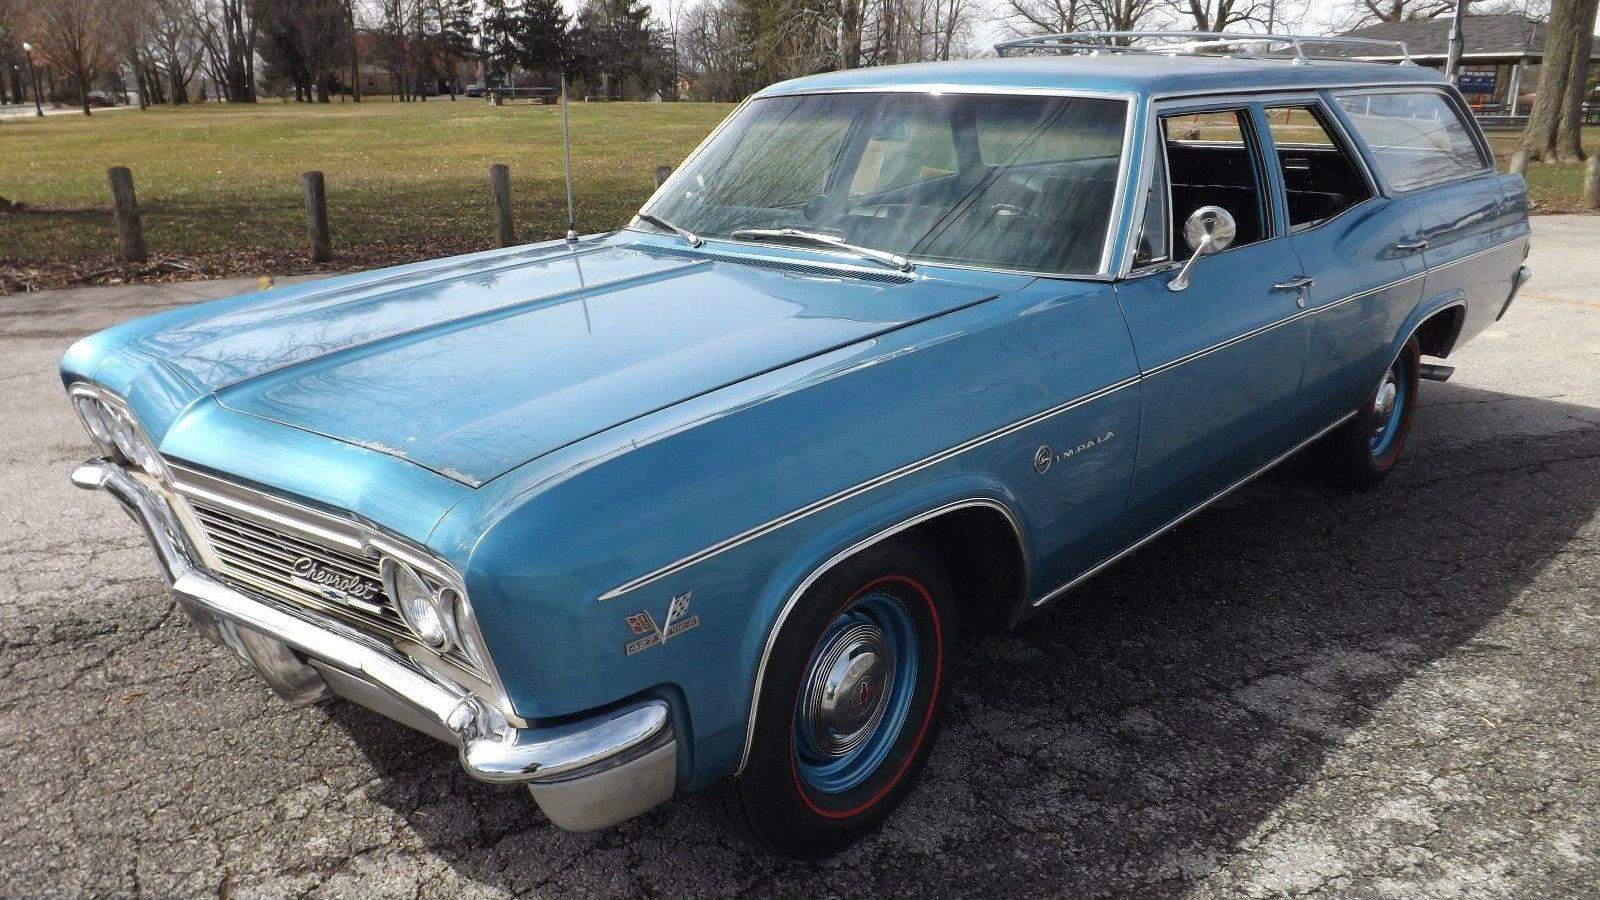 427 4 Speed 1966 Chevrolet Impala Wagon Chevy Caprice